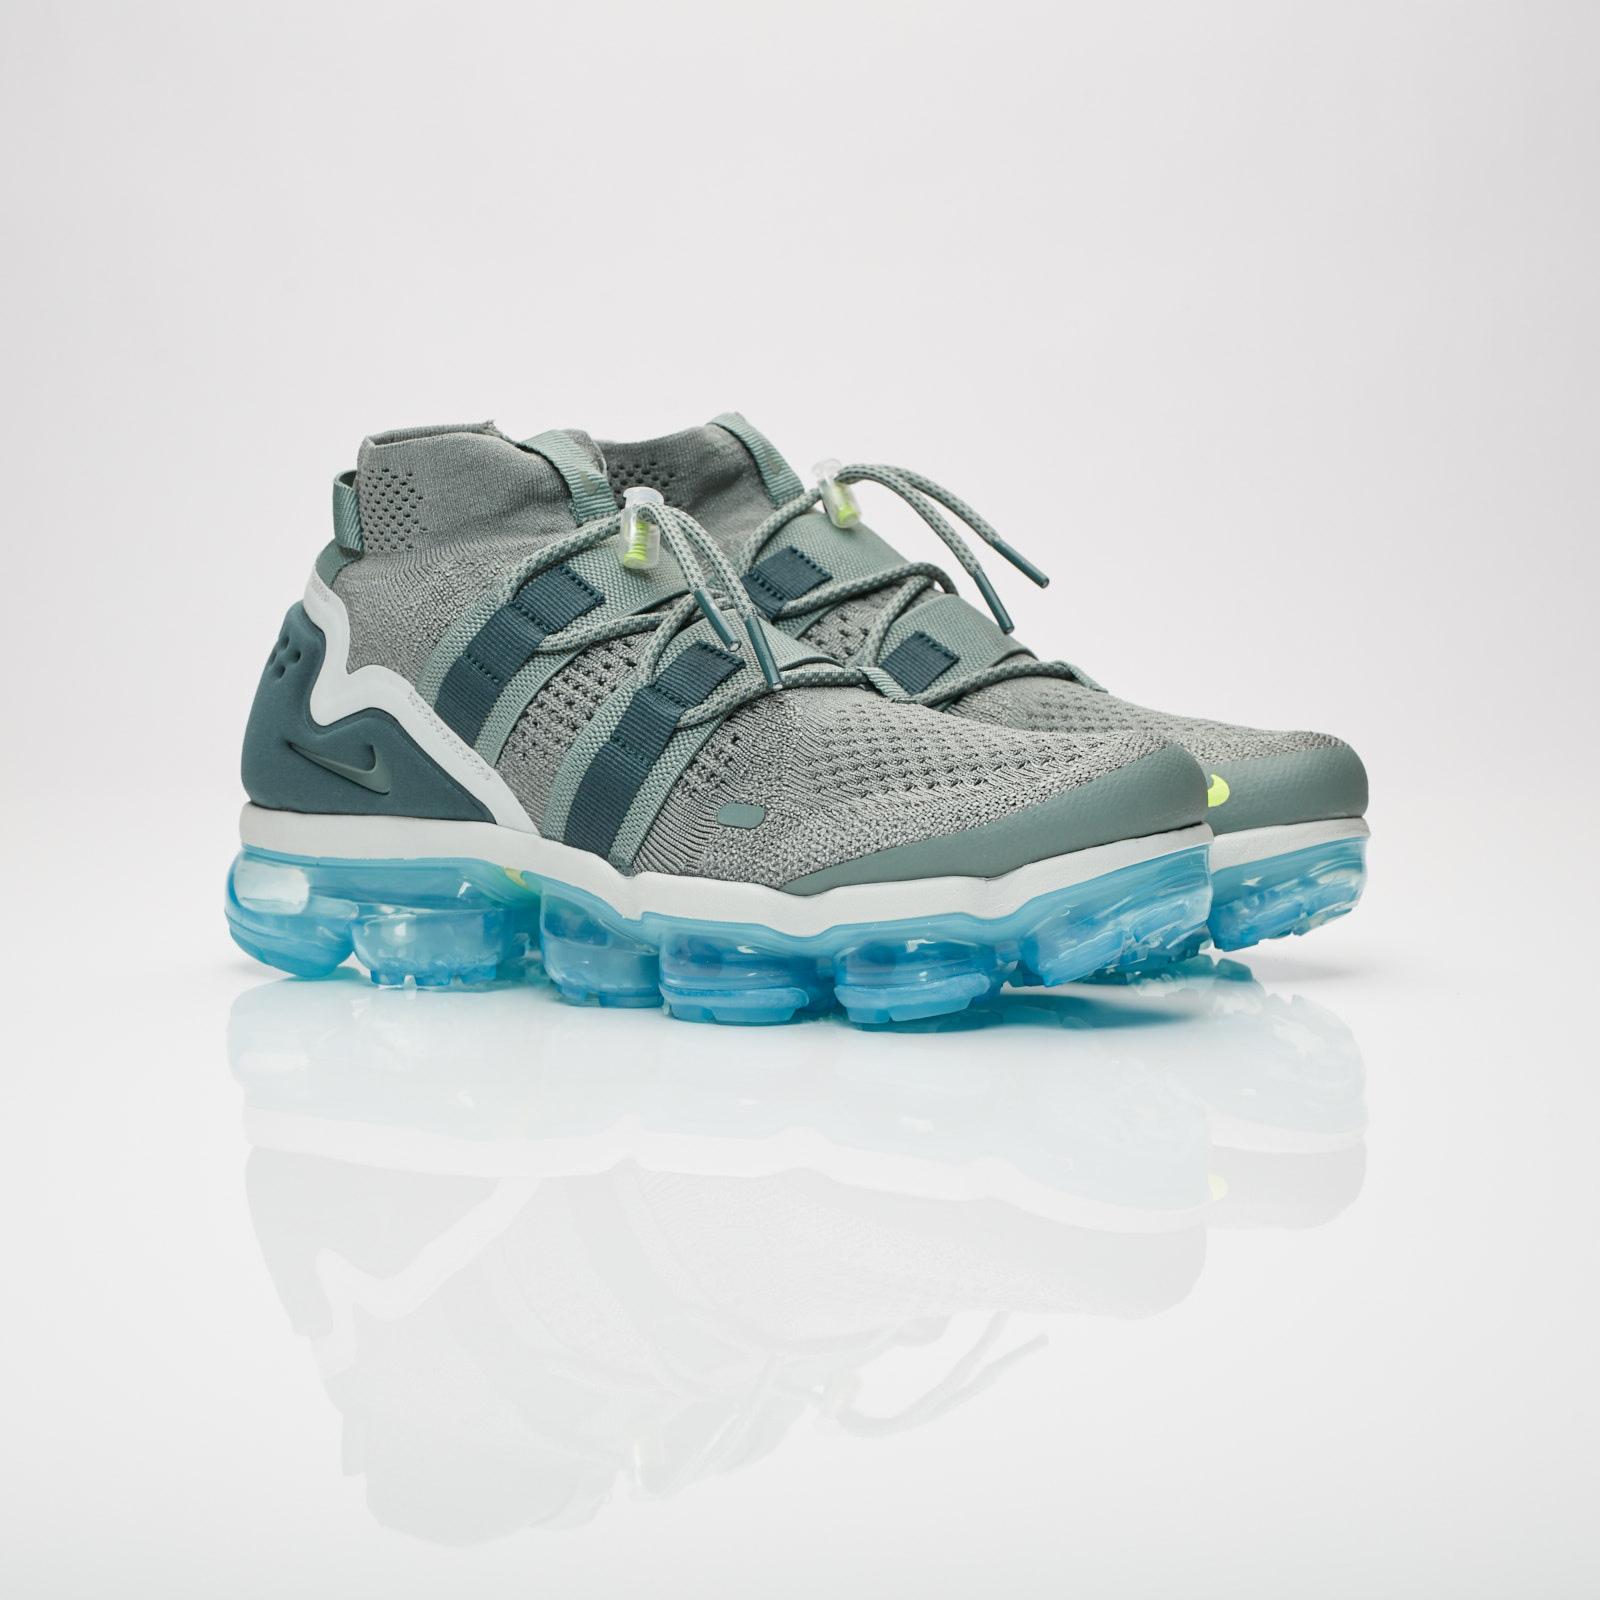 348b914dadec7 Nike Air Vapormax FK Utility - Ah6834-300 - Sneakersnstuff ...